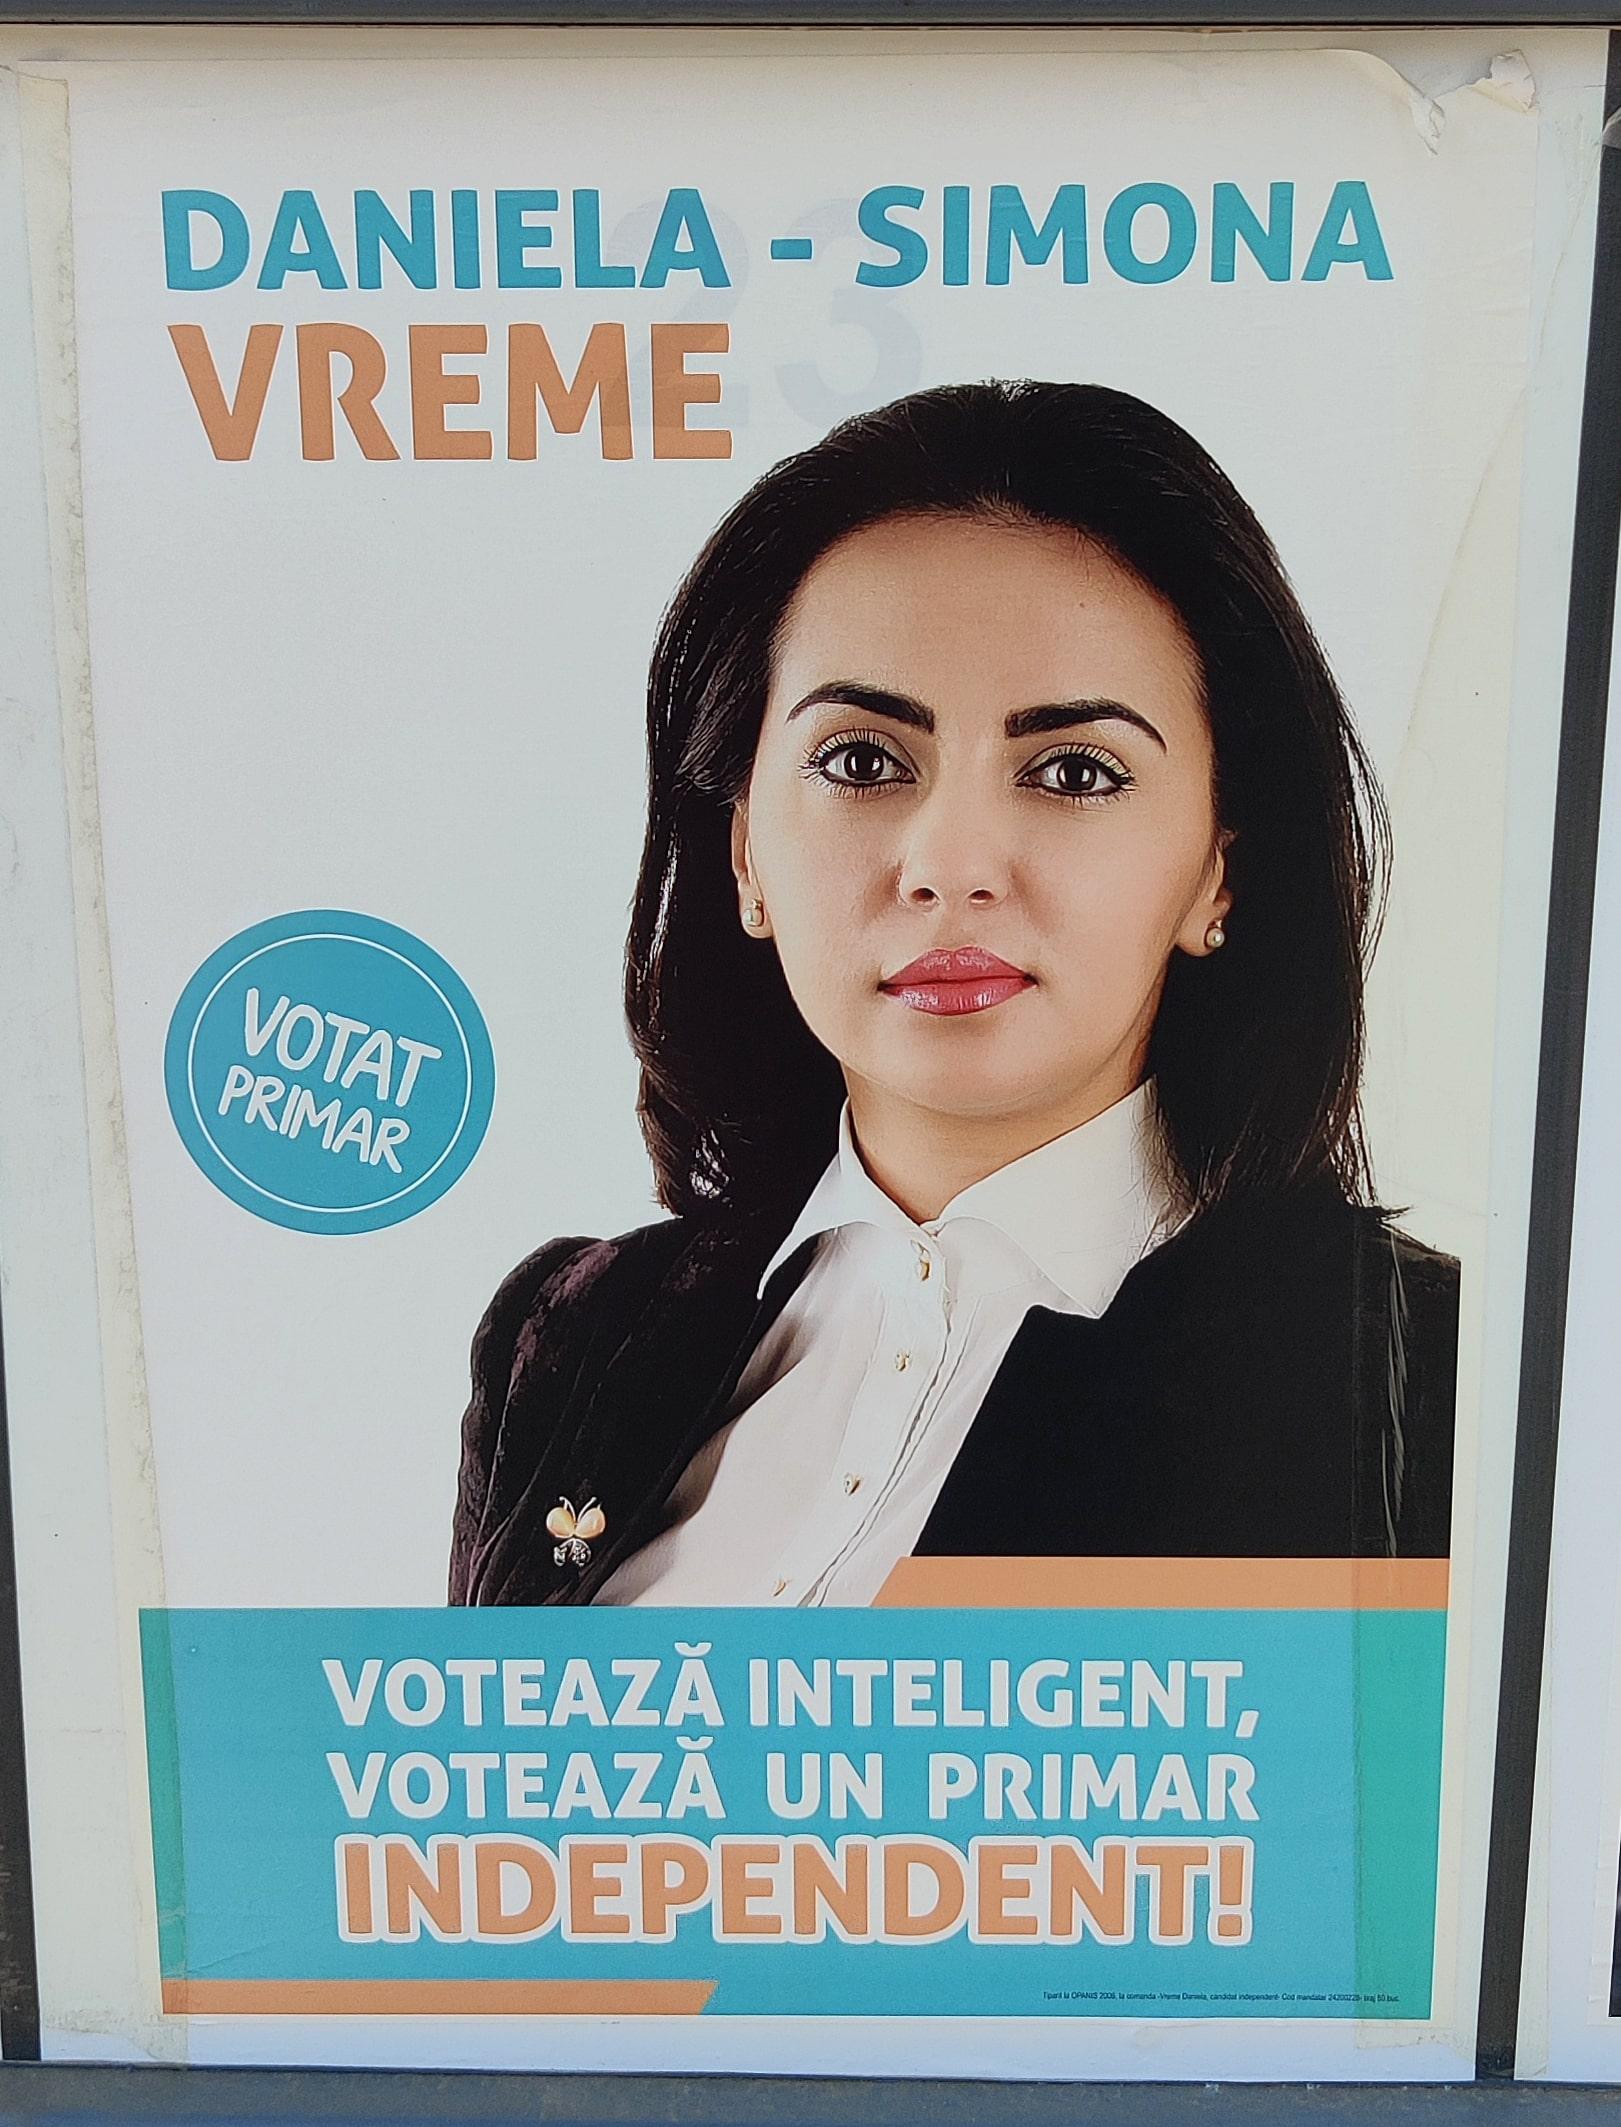 Daniela-Simona Vreme - independent - Candidat Primărie